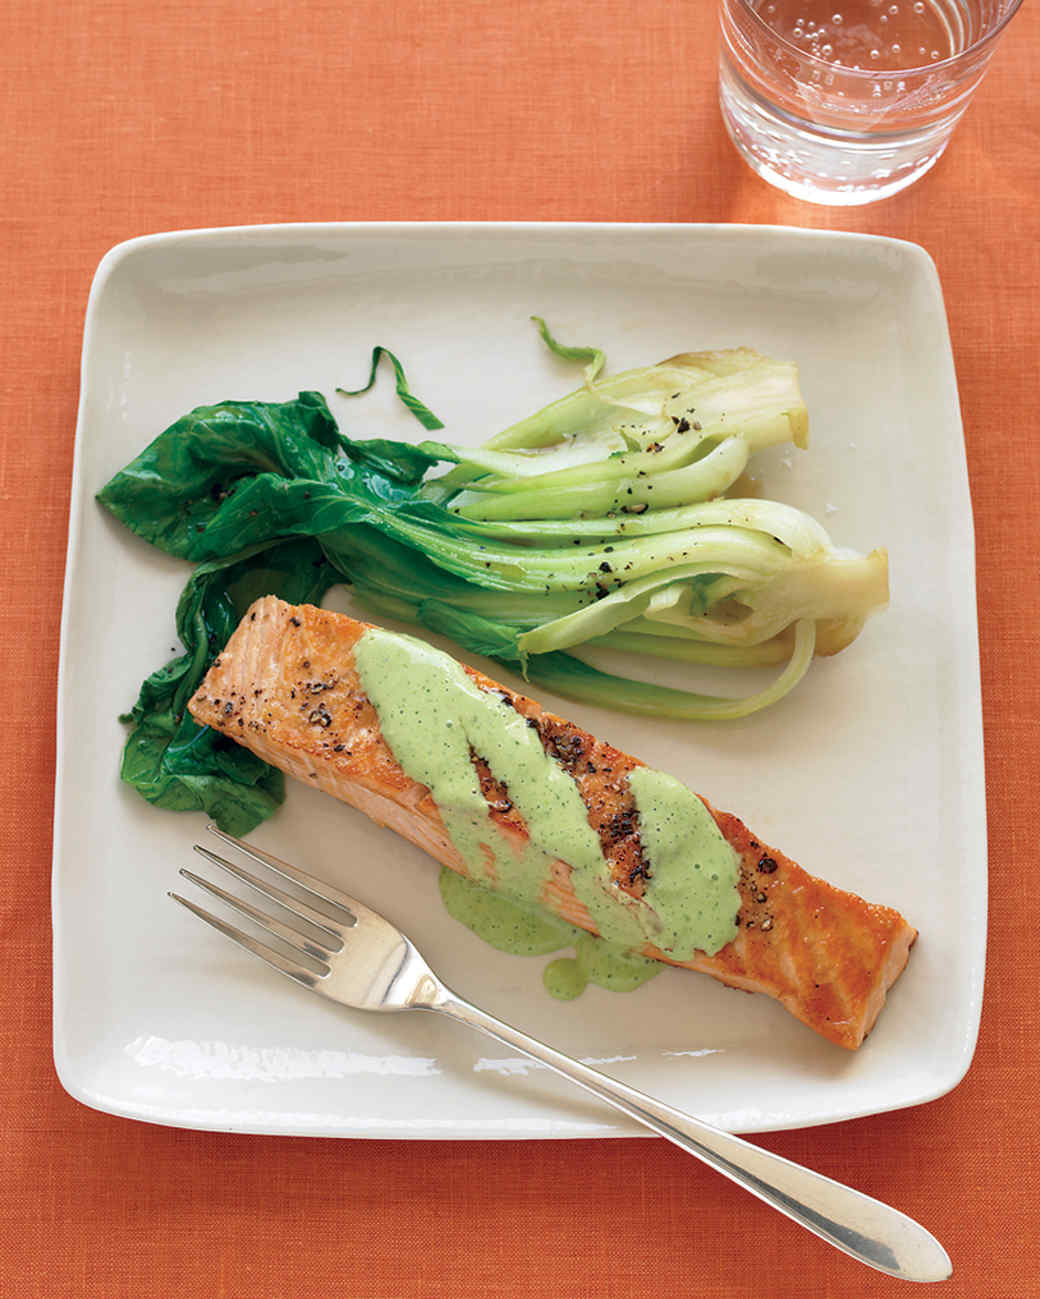 ed103160_1007_salmon.jpg